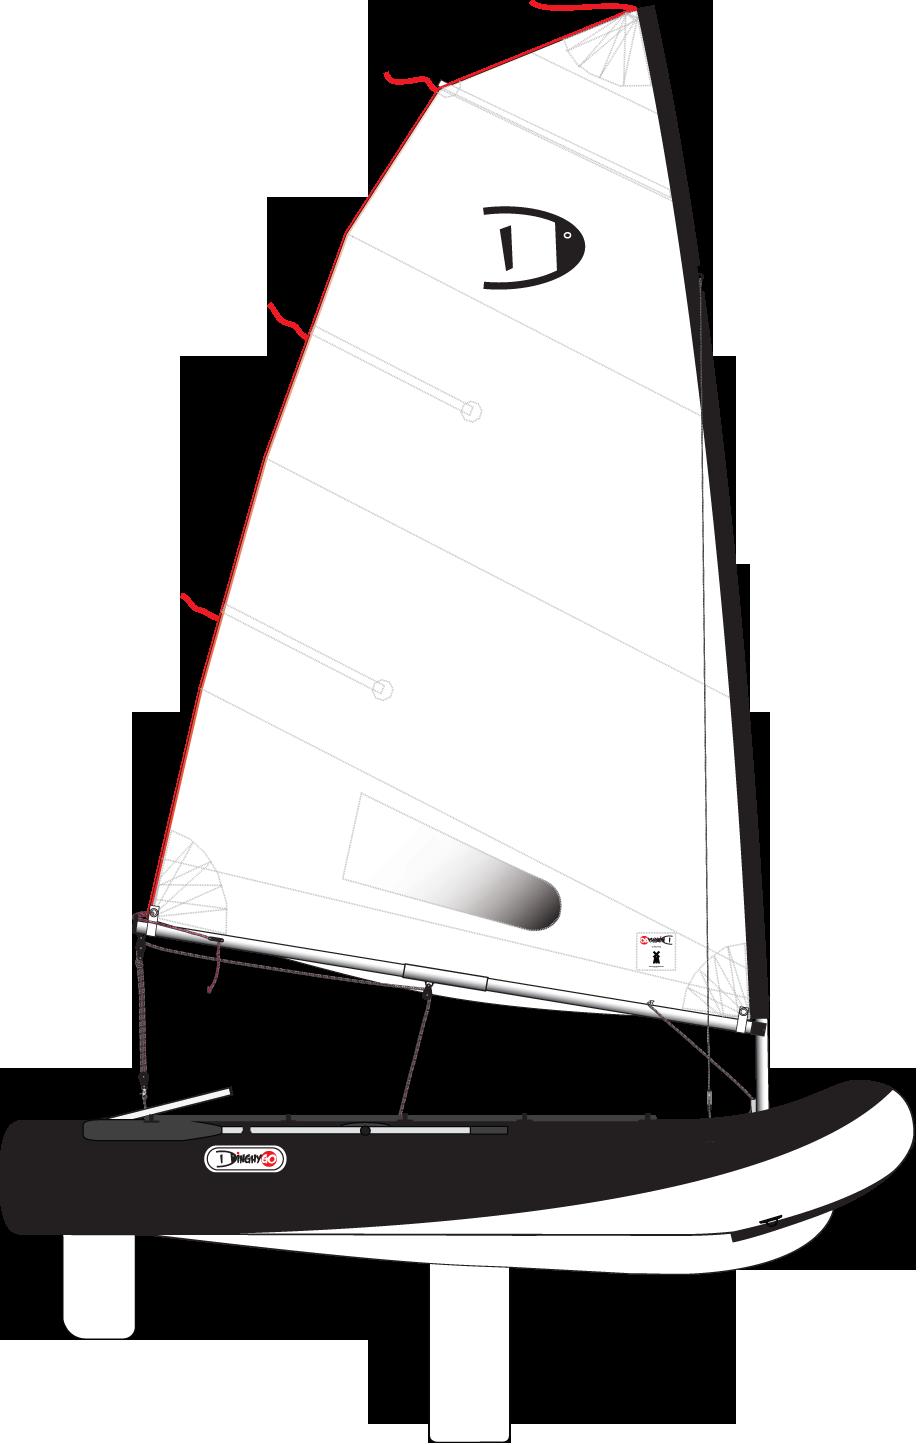 DinghyGo Orca (Reservierung Lieferung Mai 2019)